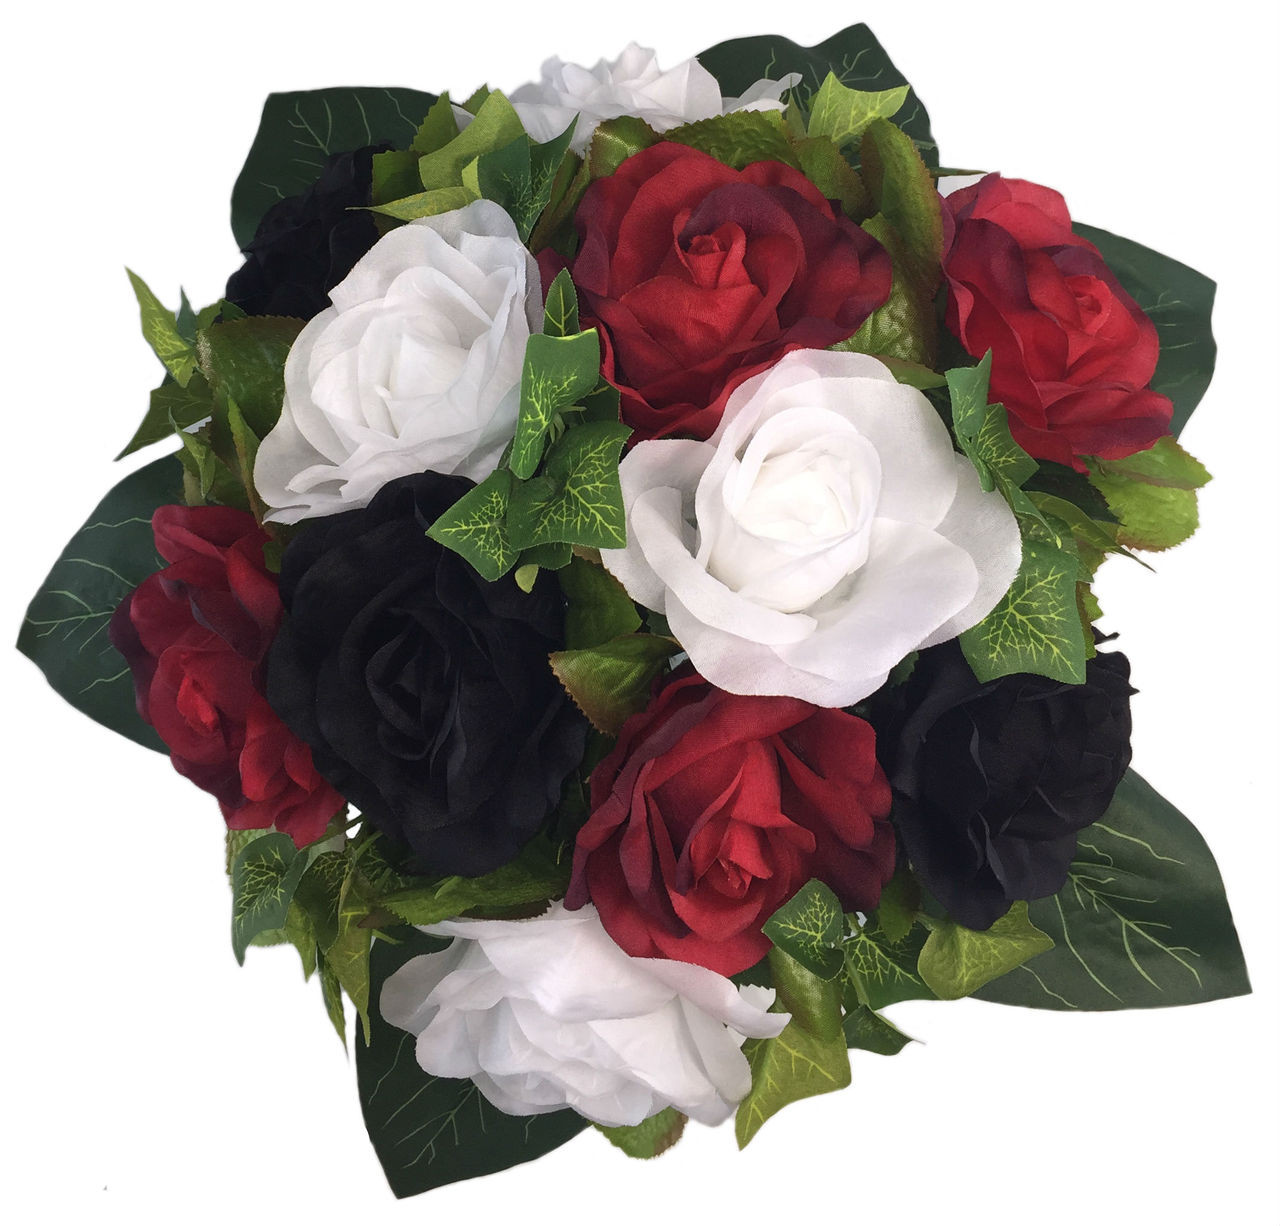 Red White And Black Silk Rose Round Artificial Silk Bridal Wedding Bouquet Thebridesbouquet Com